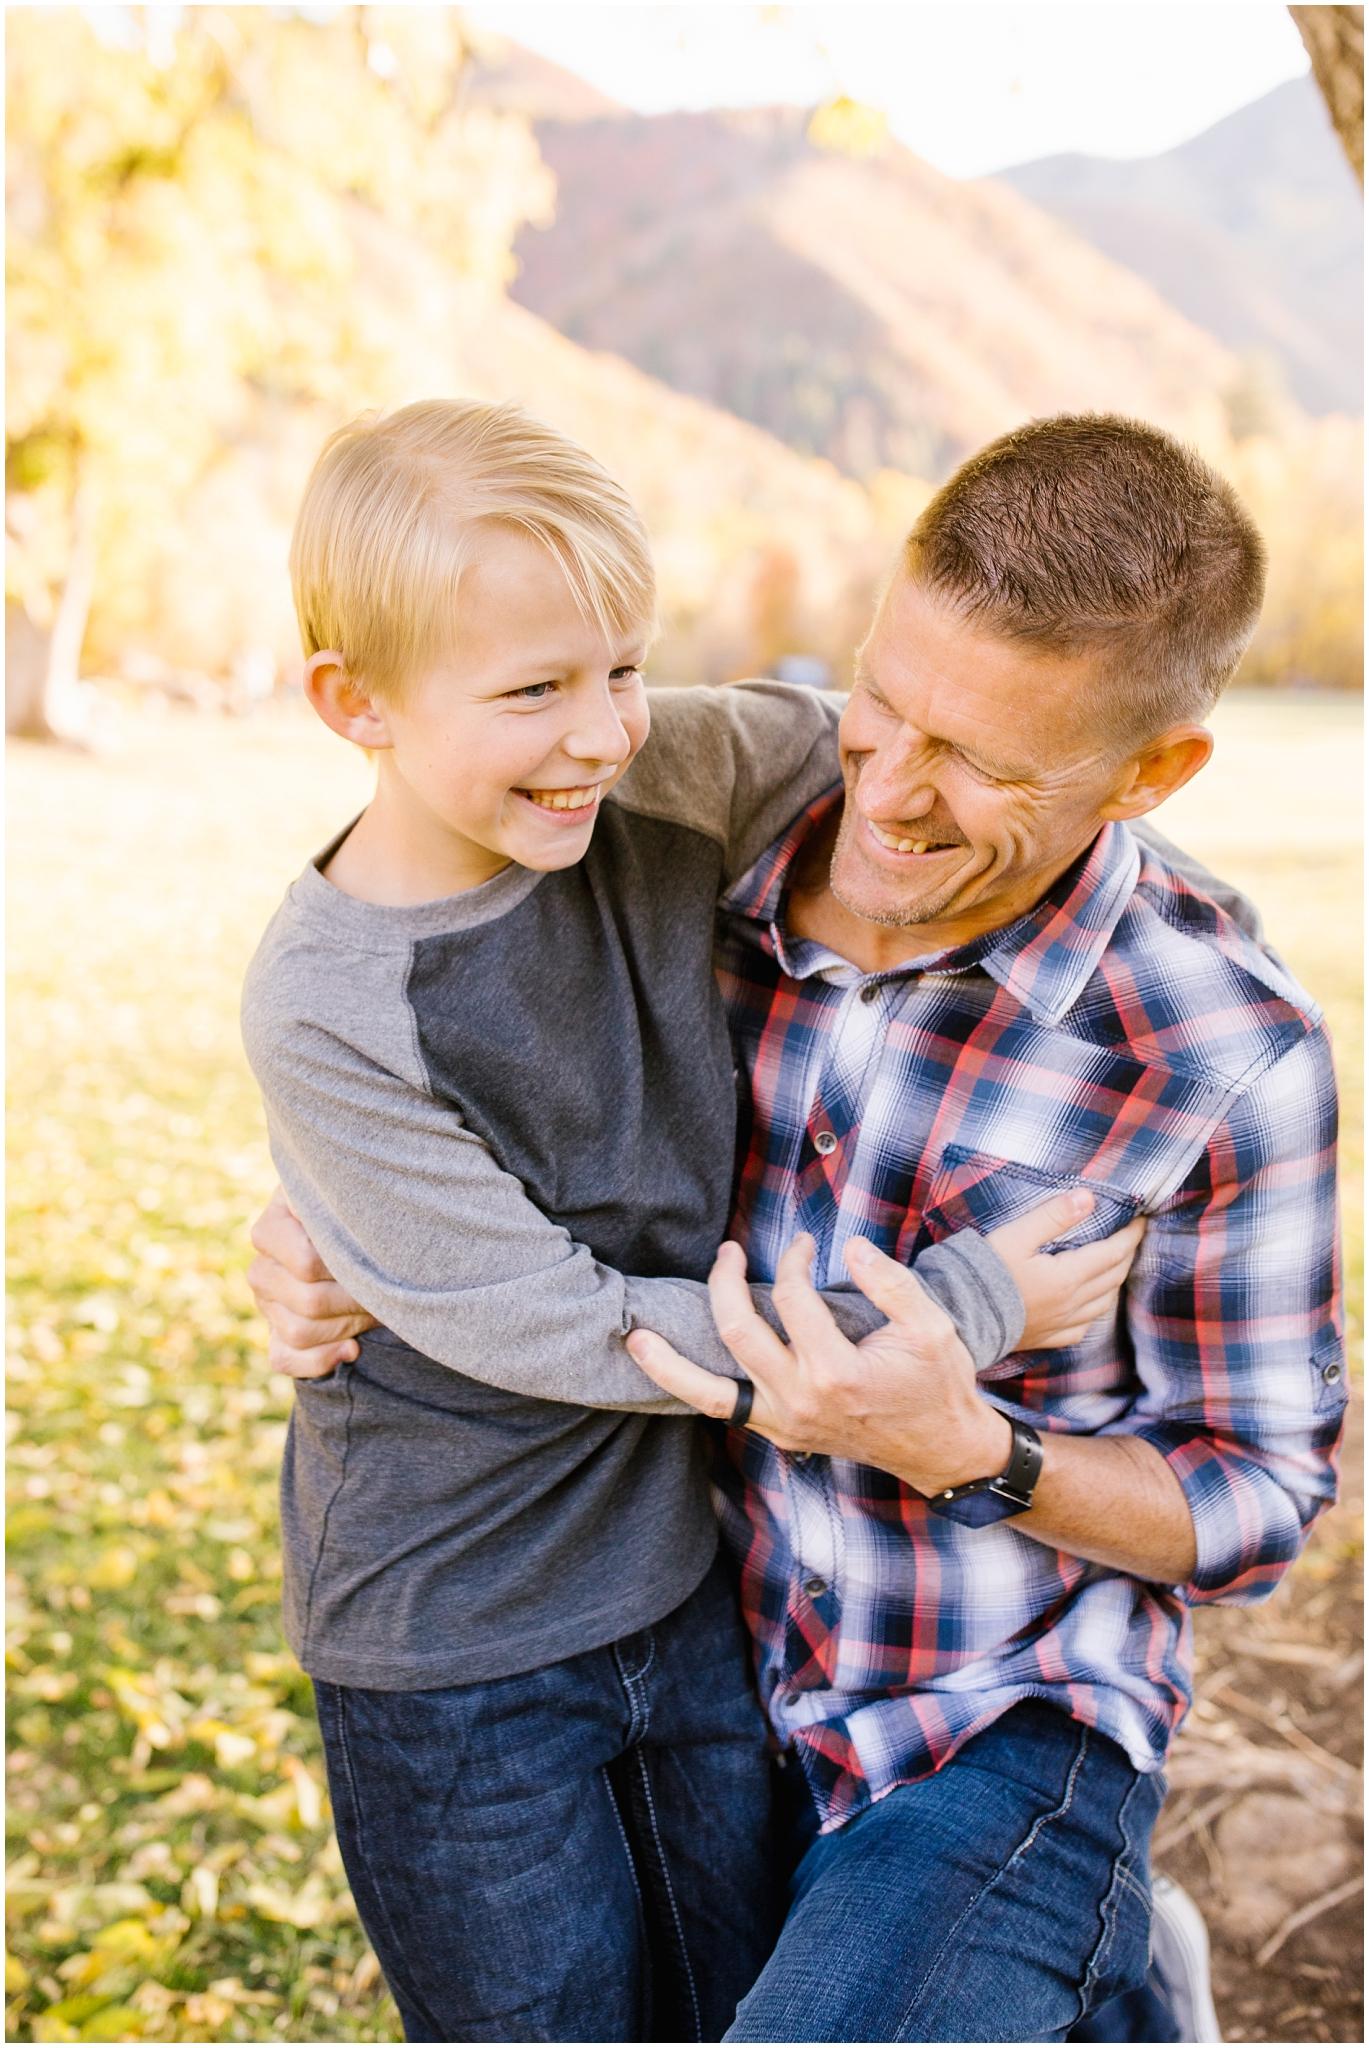 Nielsen--40_Lizzie-B-Imagery-Utah-Family-Photographer-Park-City-Salt-Lake-City-Hobble-Creek-Canyon-Jolleys-Ranch.jpg